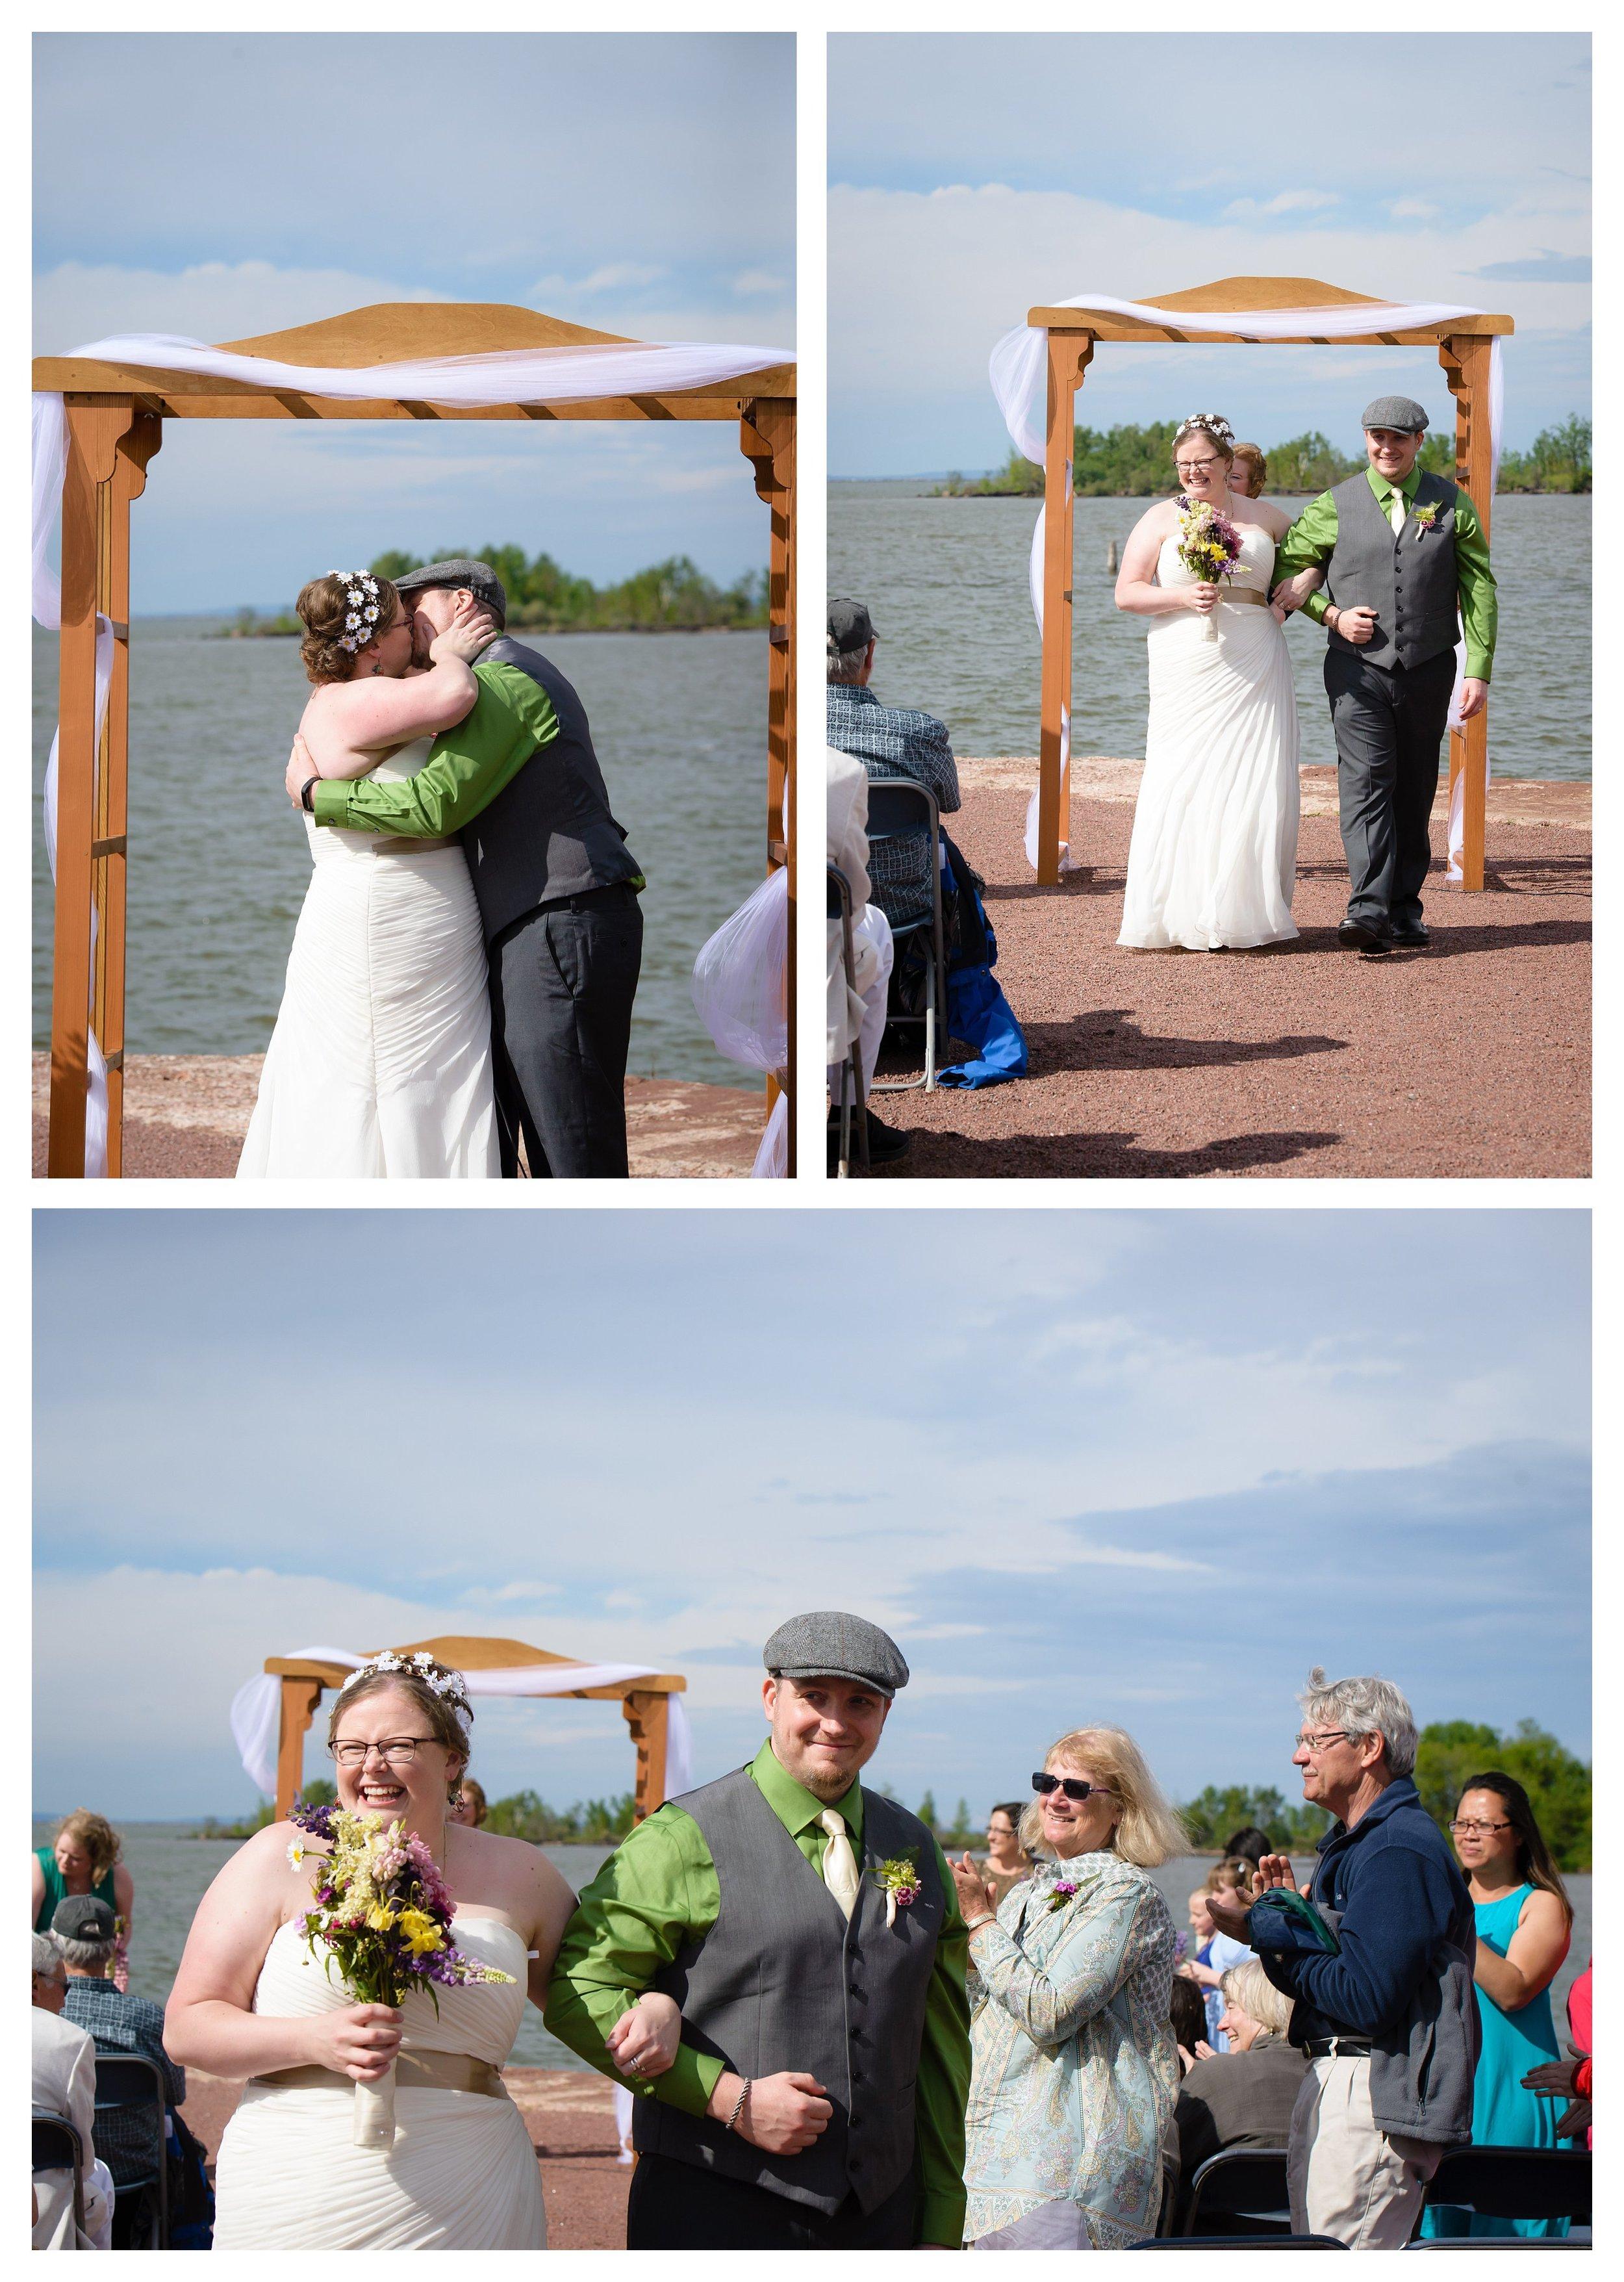 ashland oredock northwoods wisconsin wedding ps 139 photography_0292.jpg